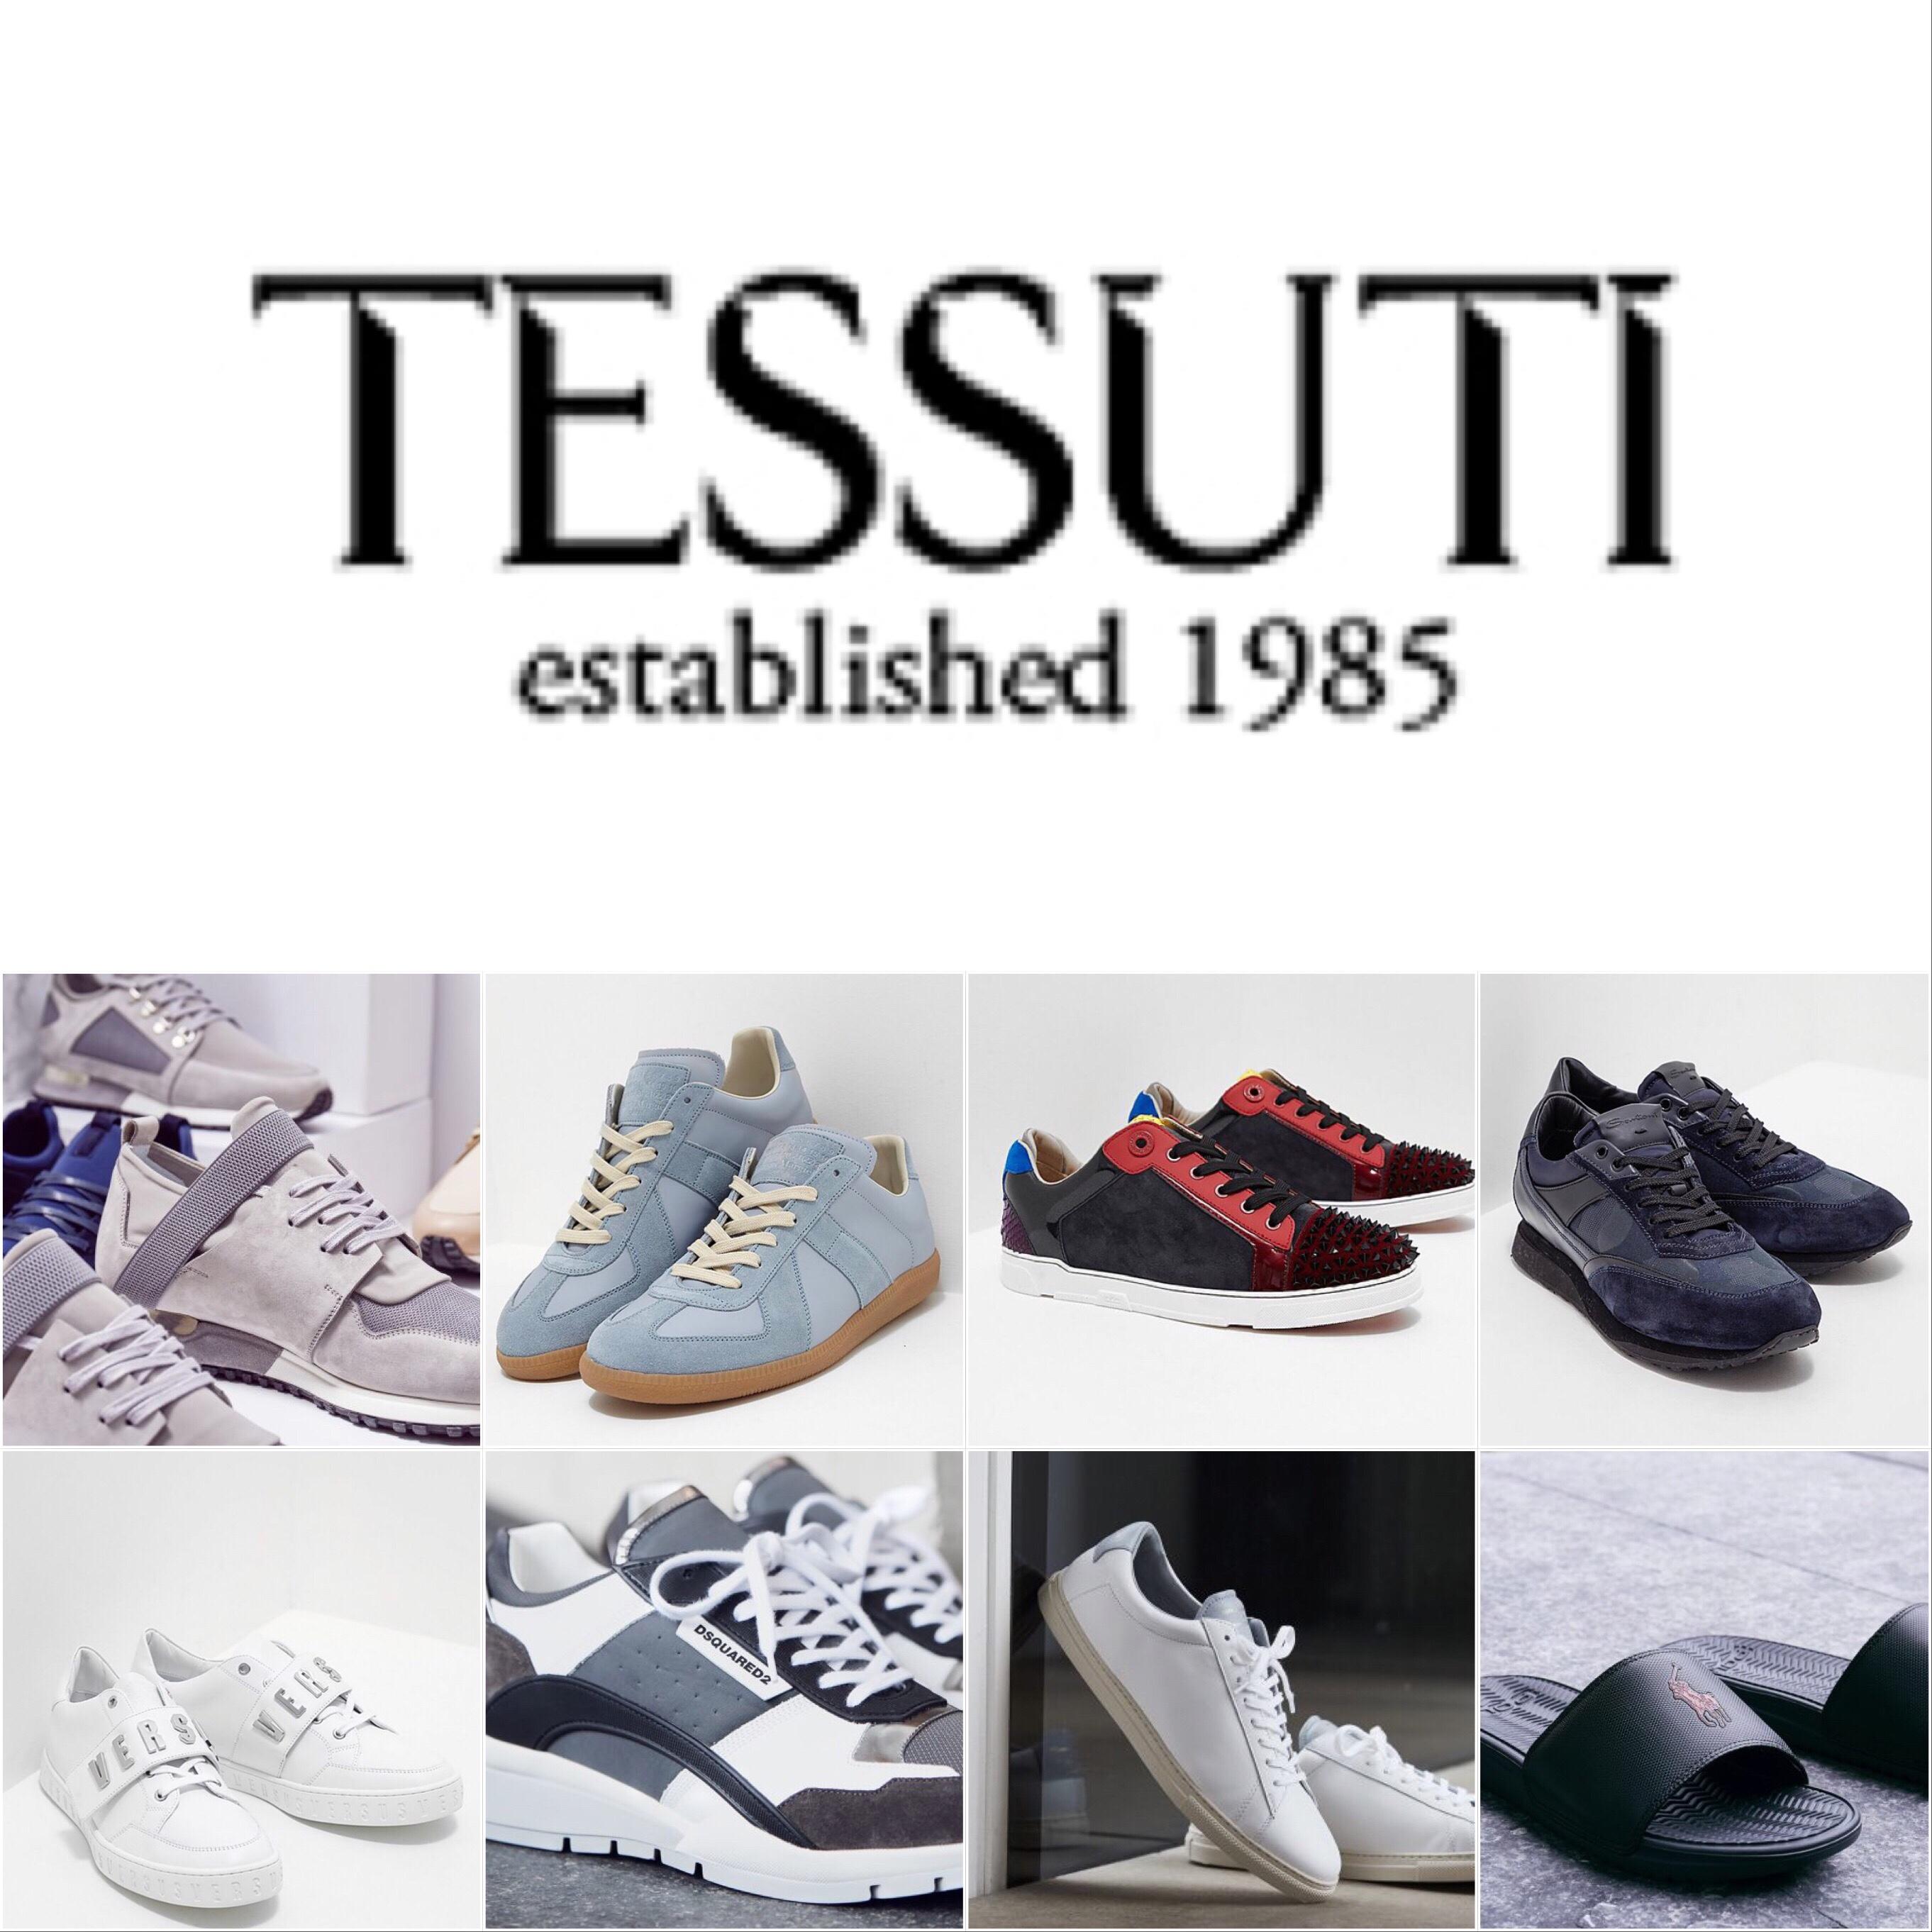 Luxury Men's Shoe Buyer Guide by Tessuti